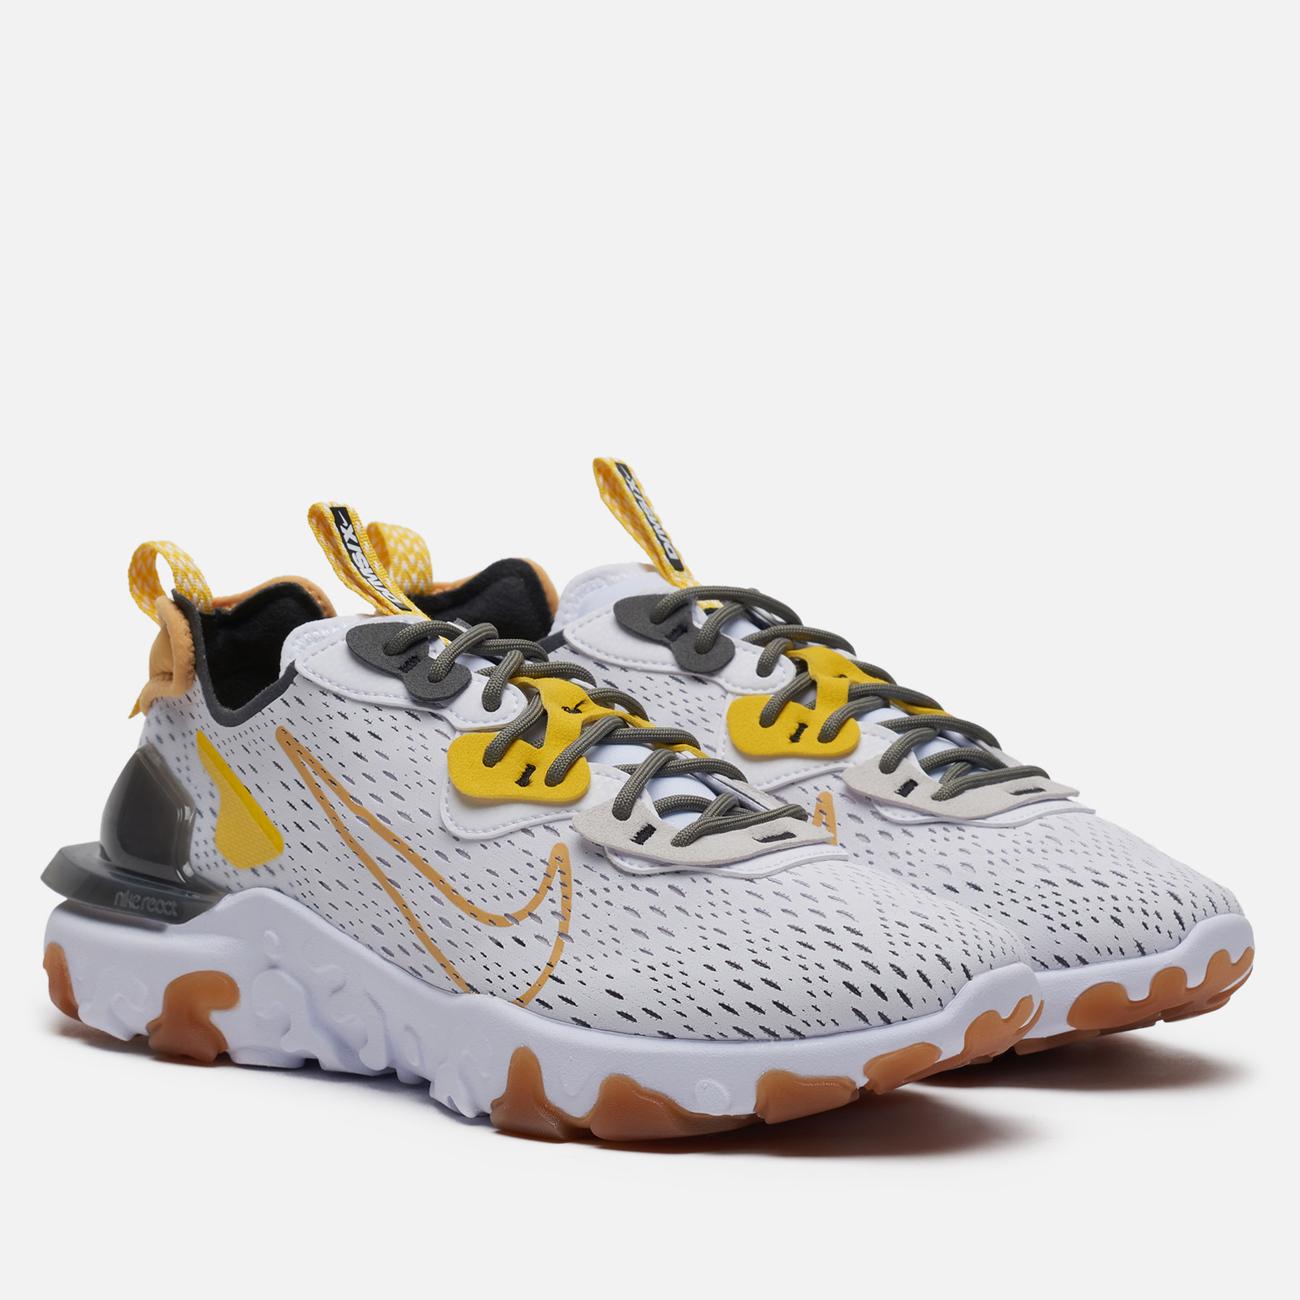 Мужские кроссовки Nike React Vision White/Honeycomb/Iron Grey/Vast Grey